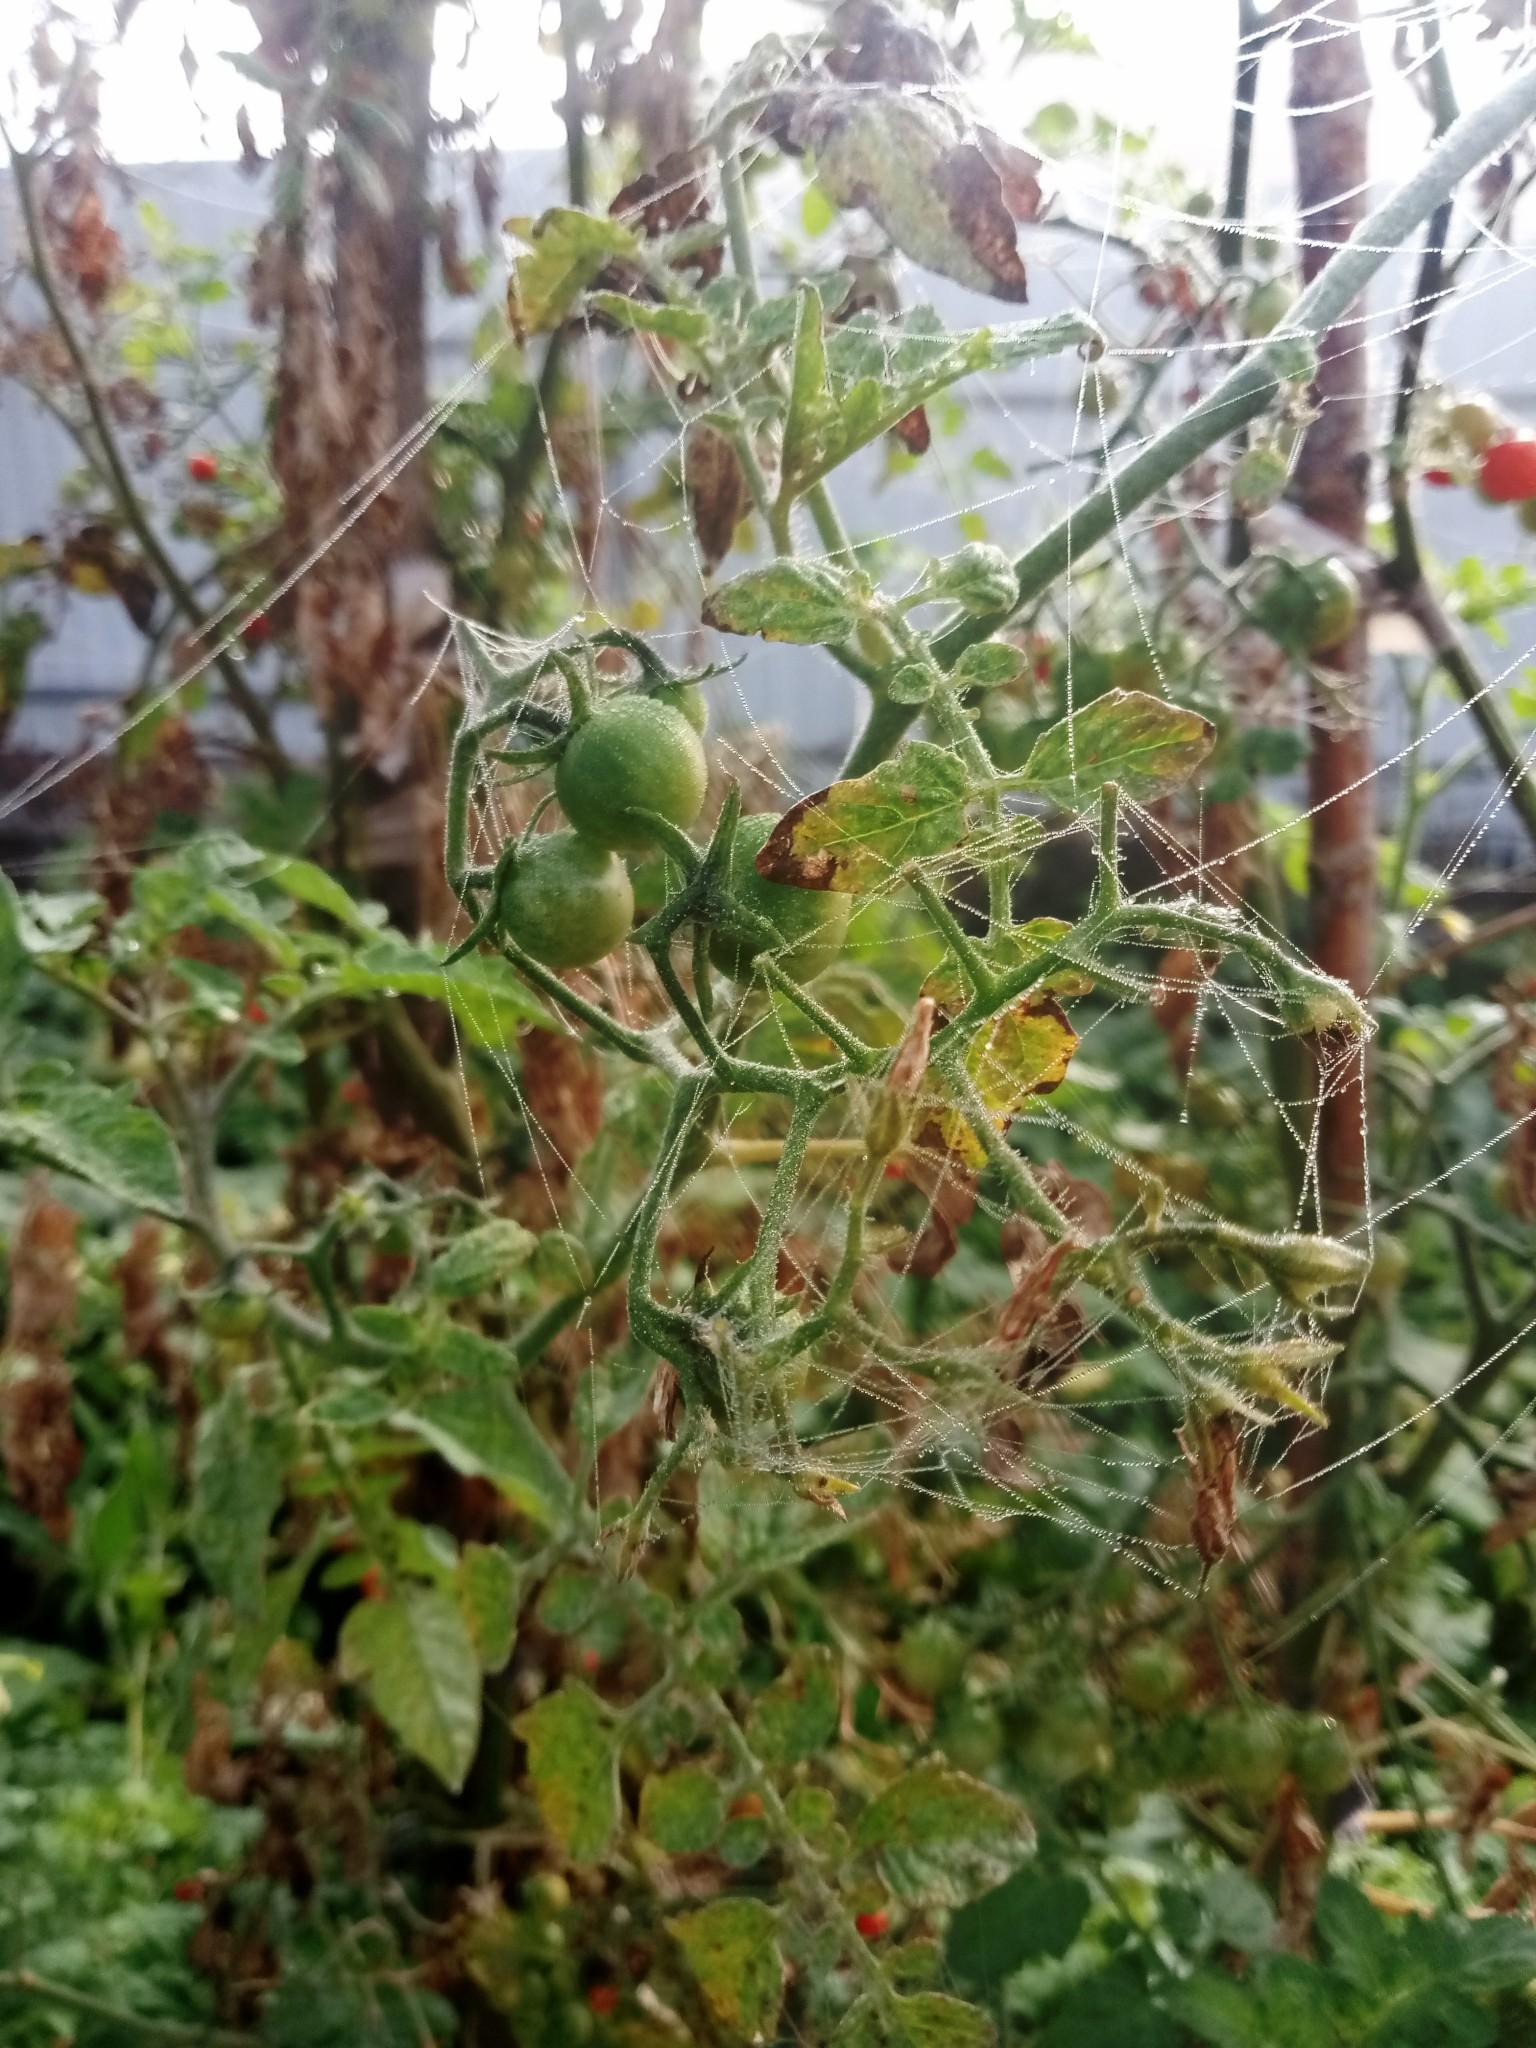 Spider web in fog photo 8